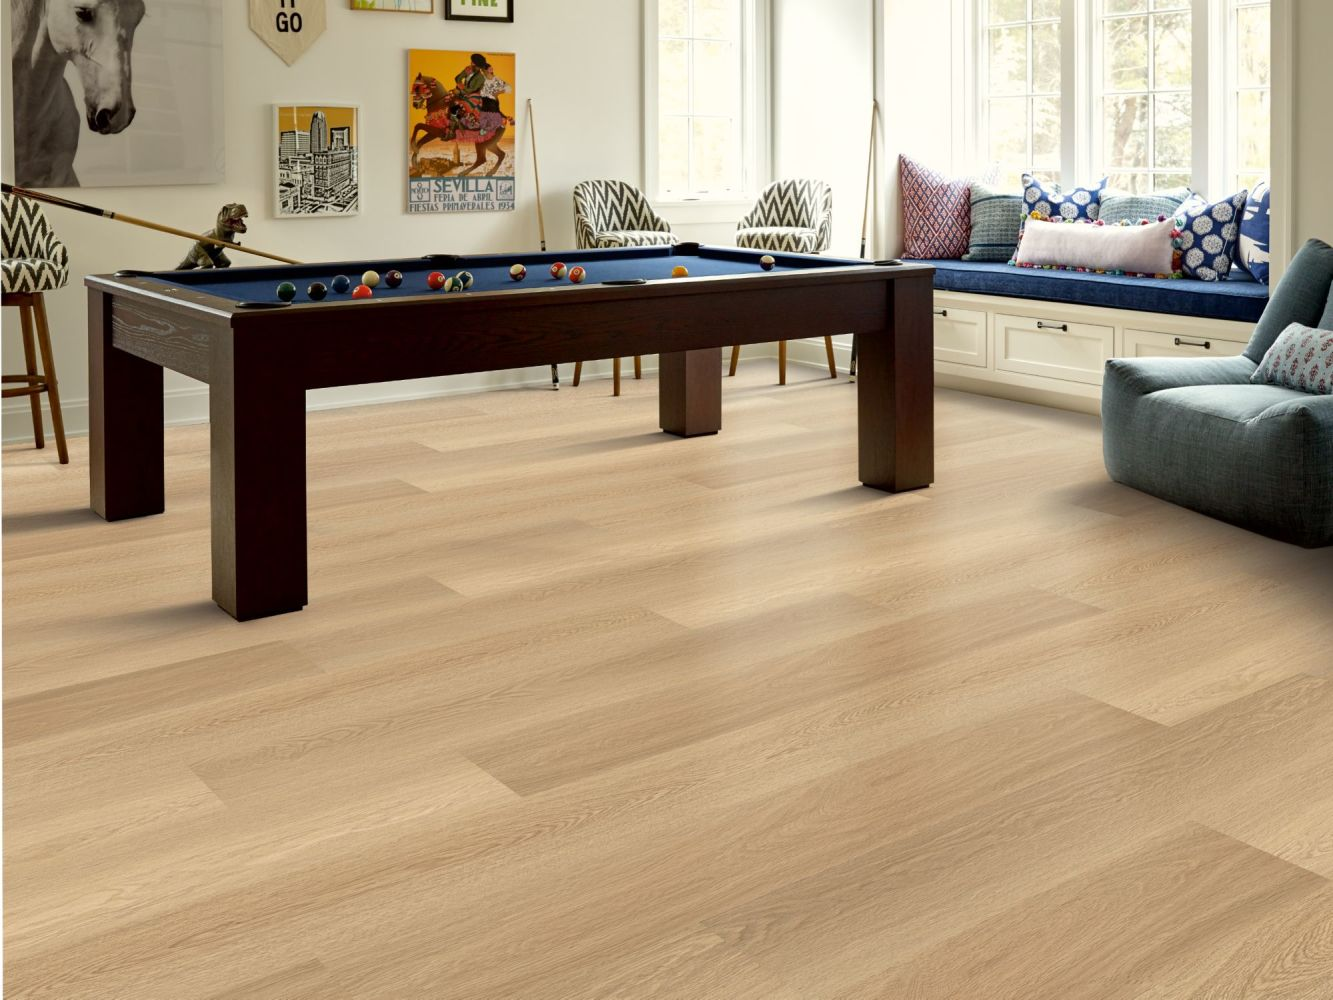 Shaw Floors SFA Paramount 512c Plus Castaway 07087_509SA